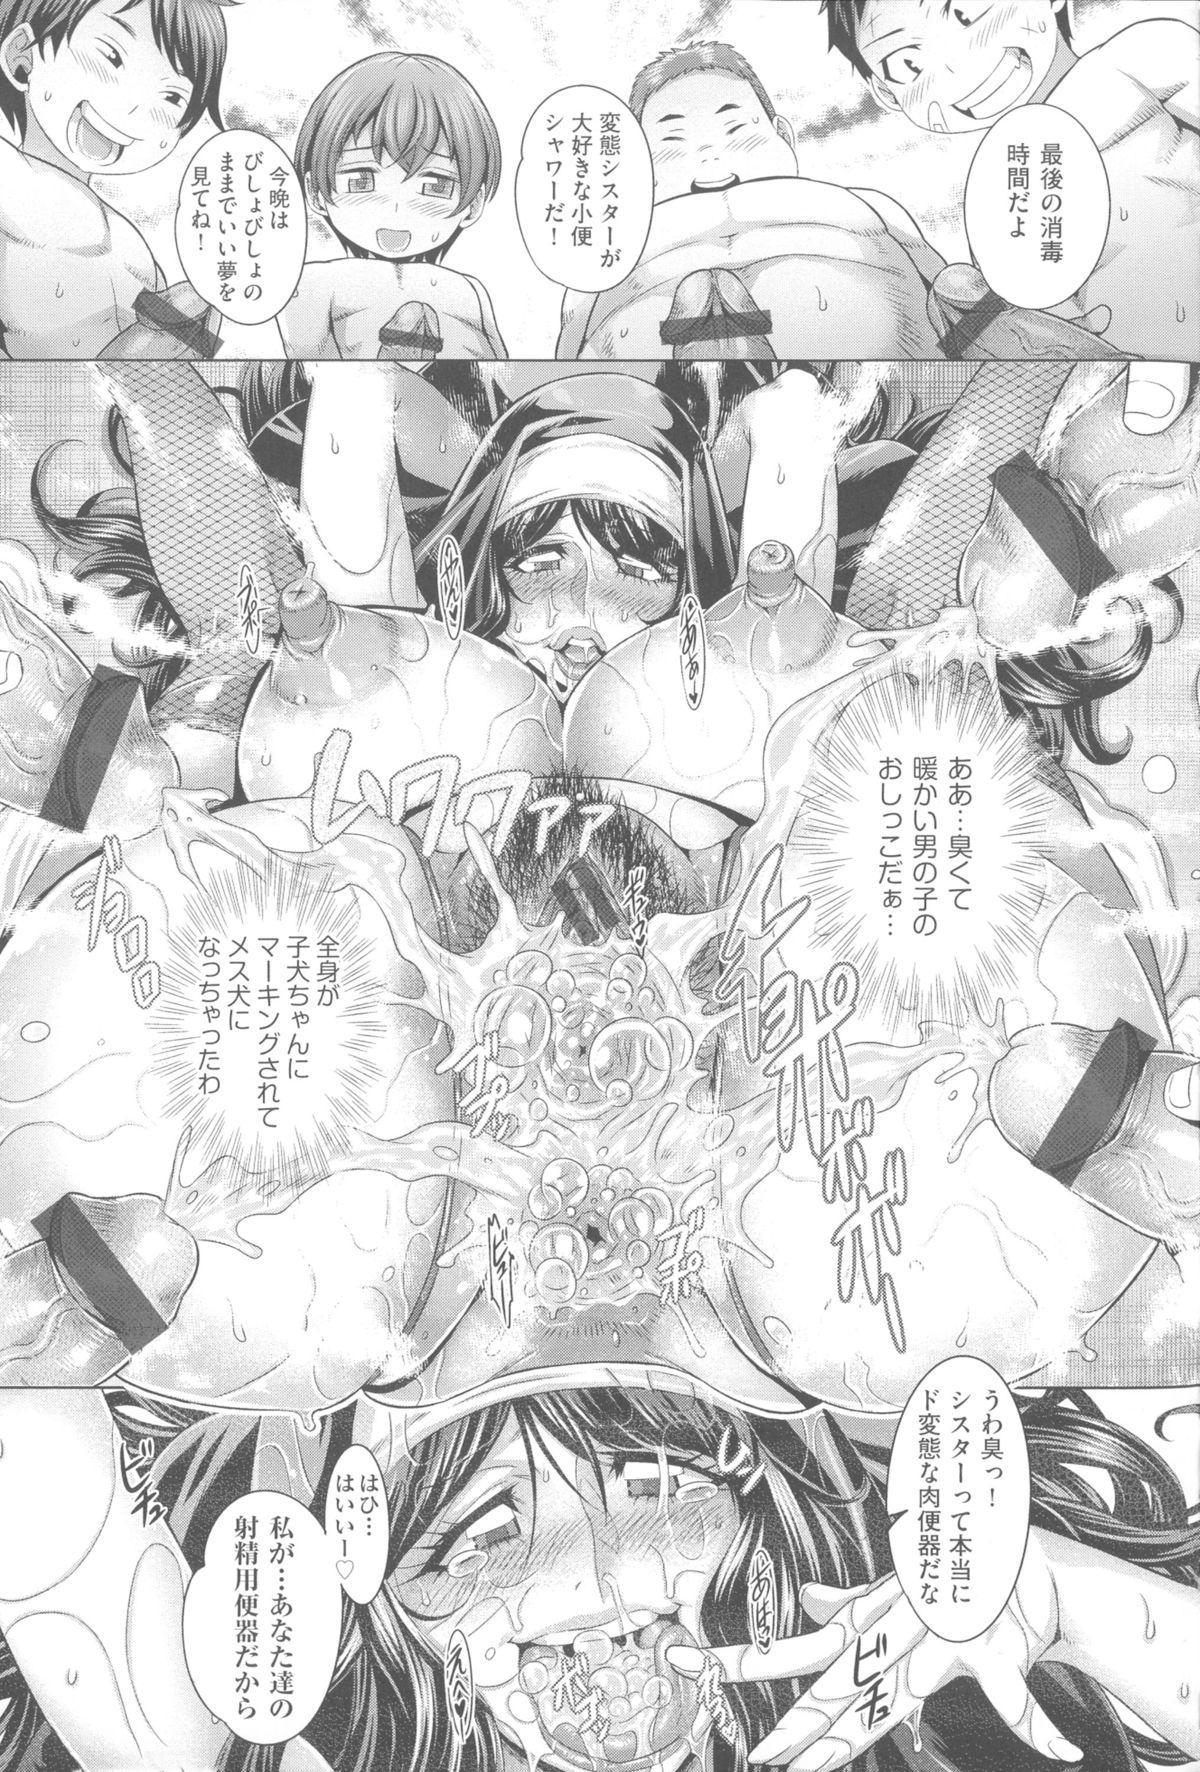 Chijou no Kiwami - Extremity of the blind love 192